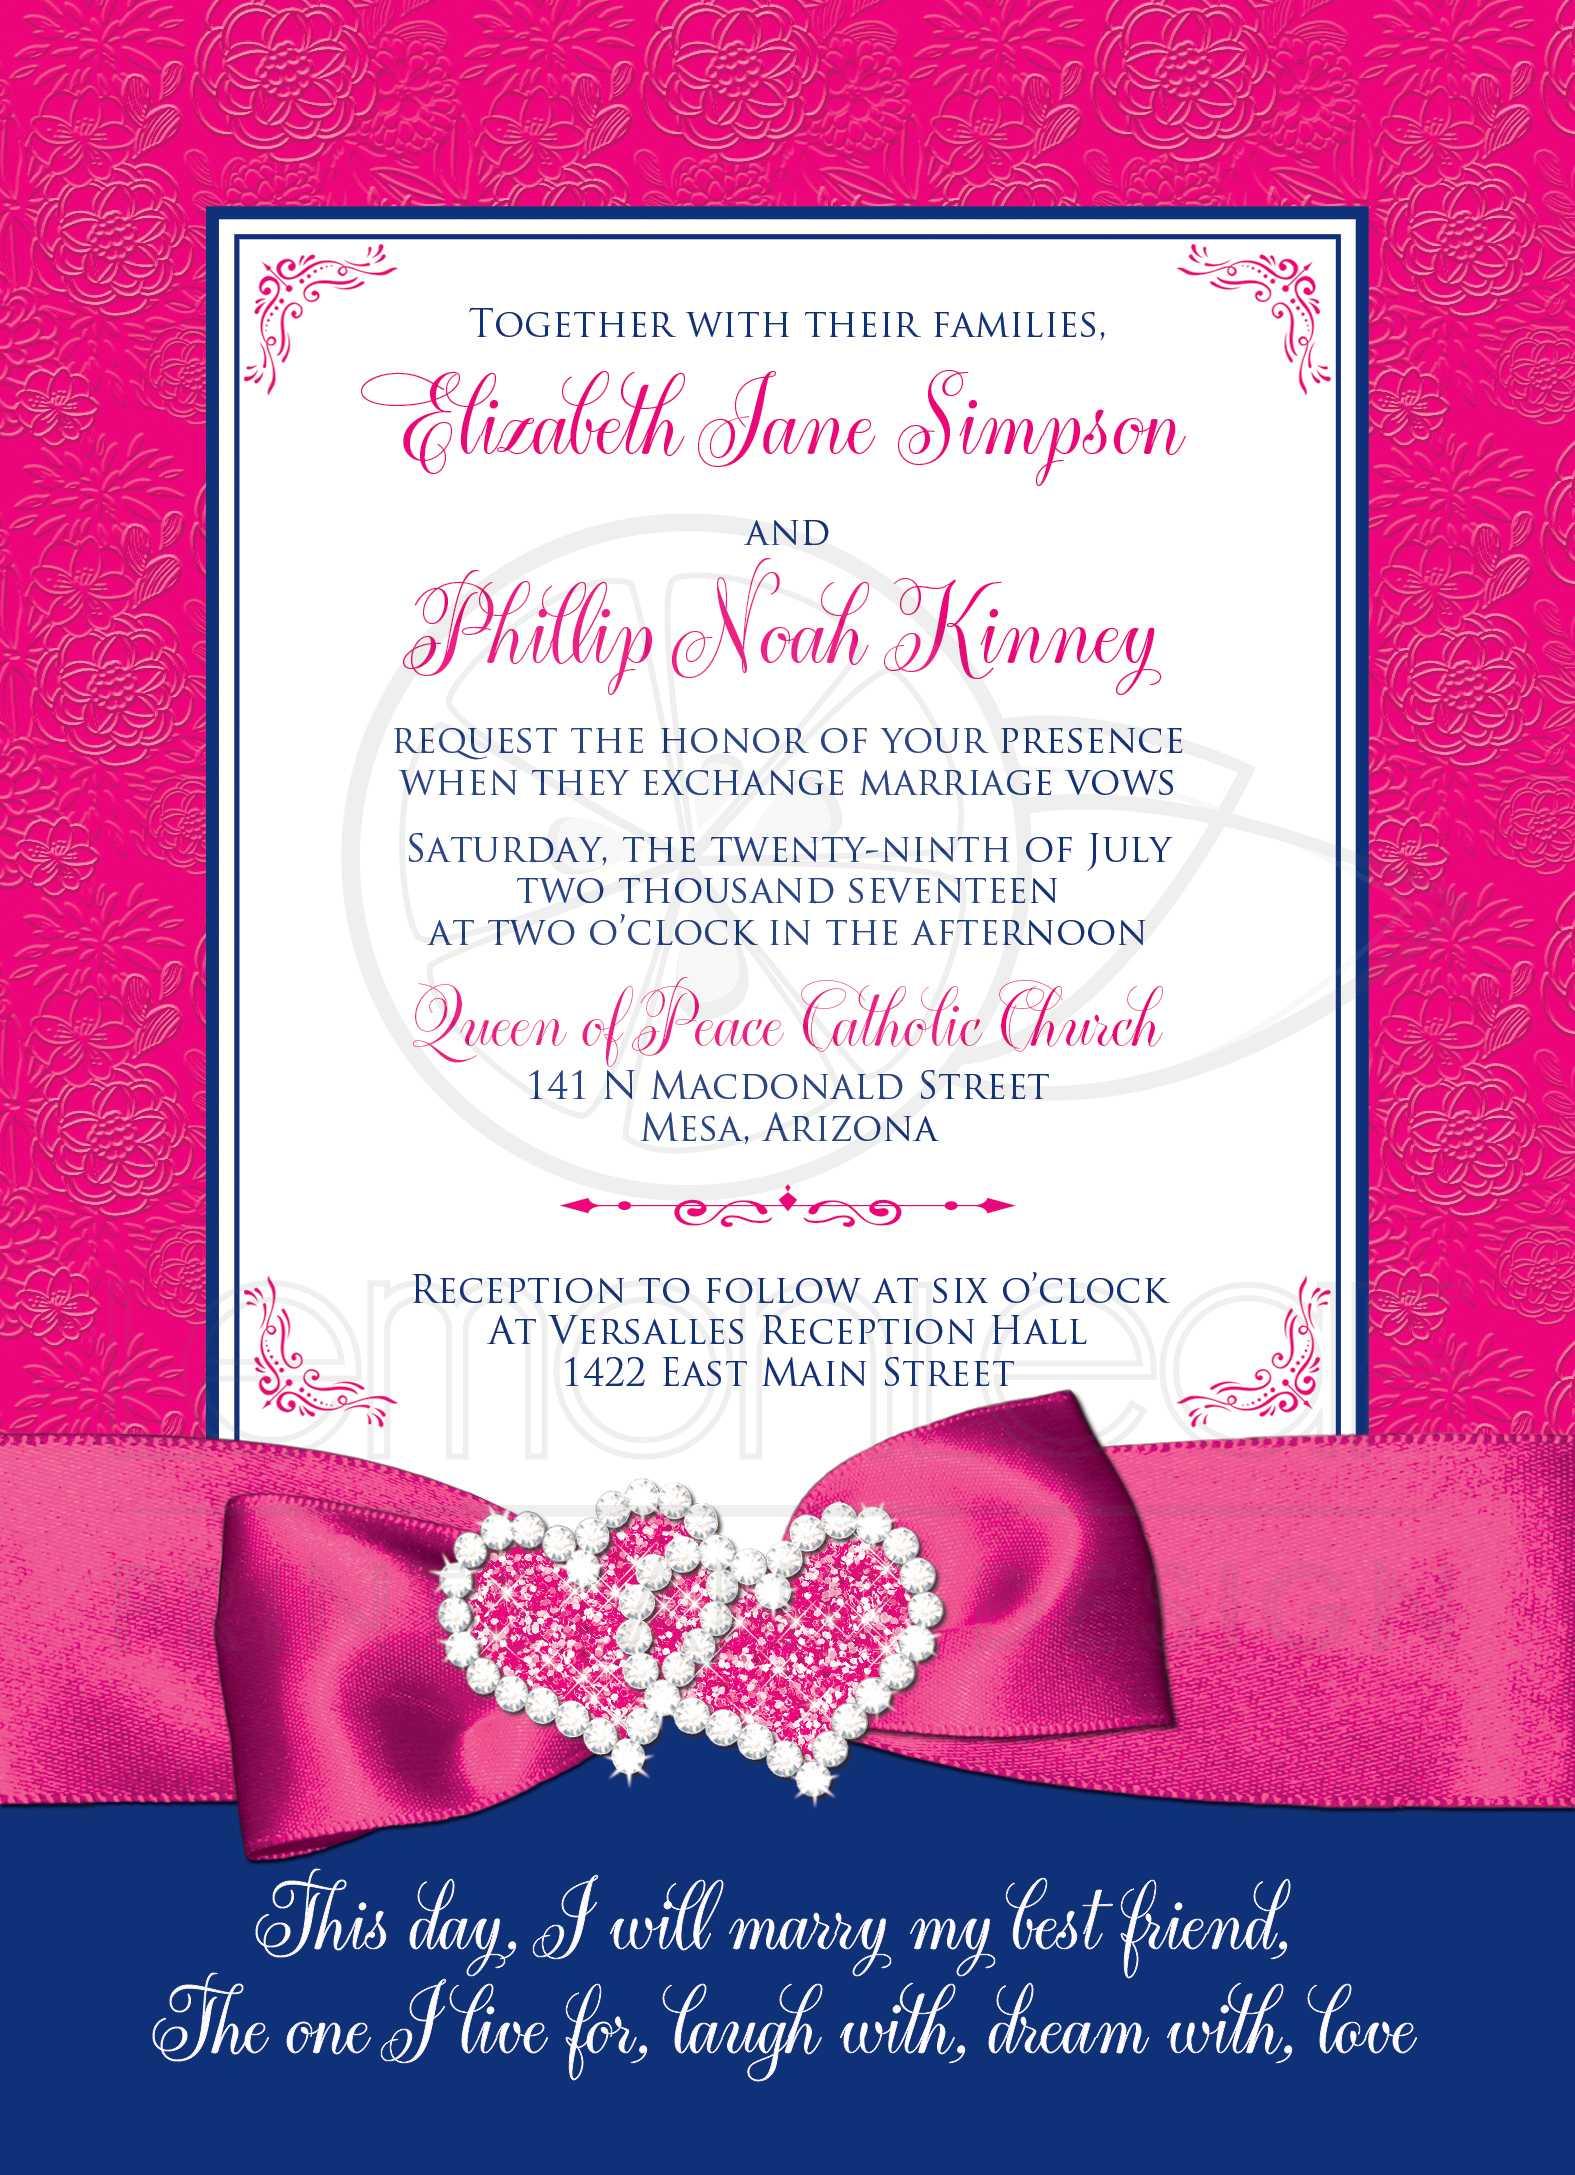 Wedding Invitation   Royal Blue, Pink, White Floral   PRINTED Ribbon ...